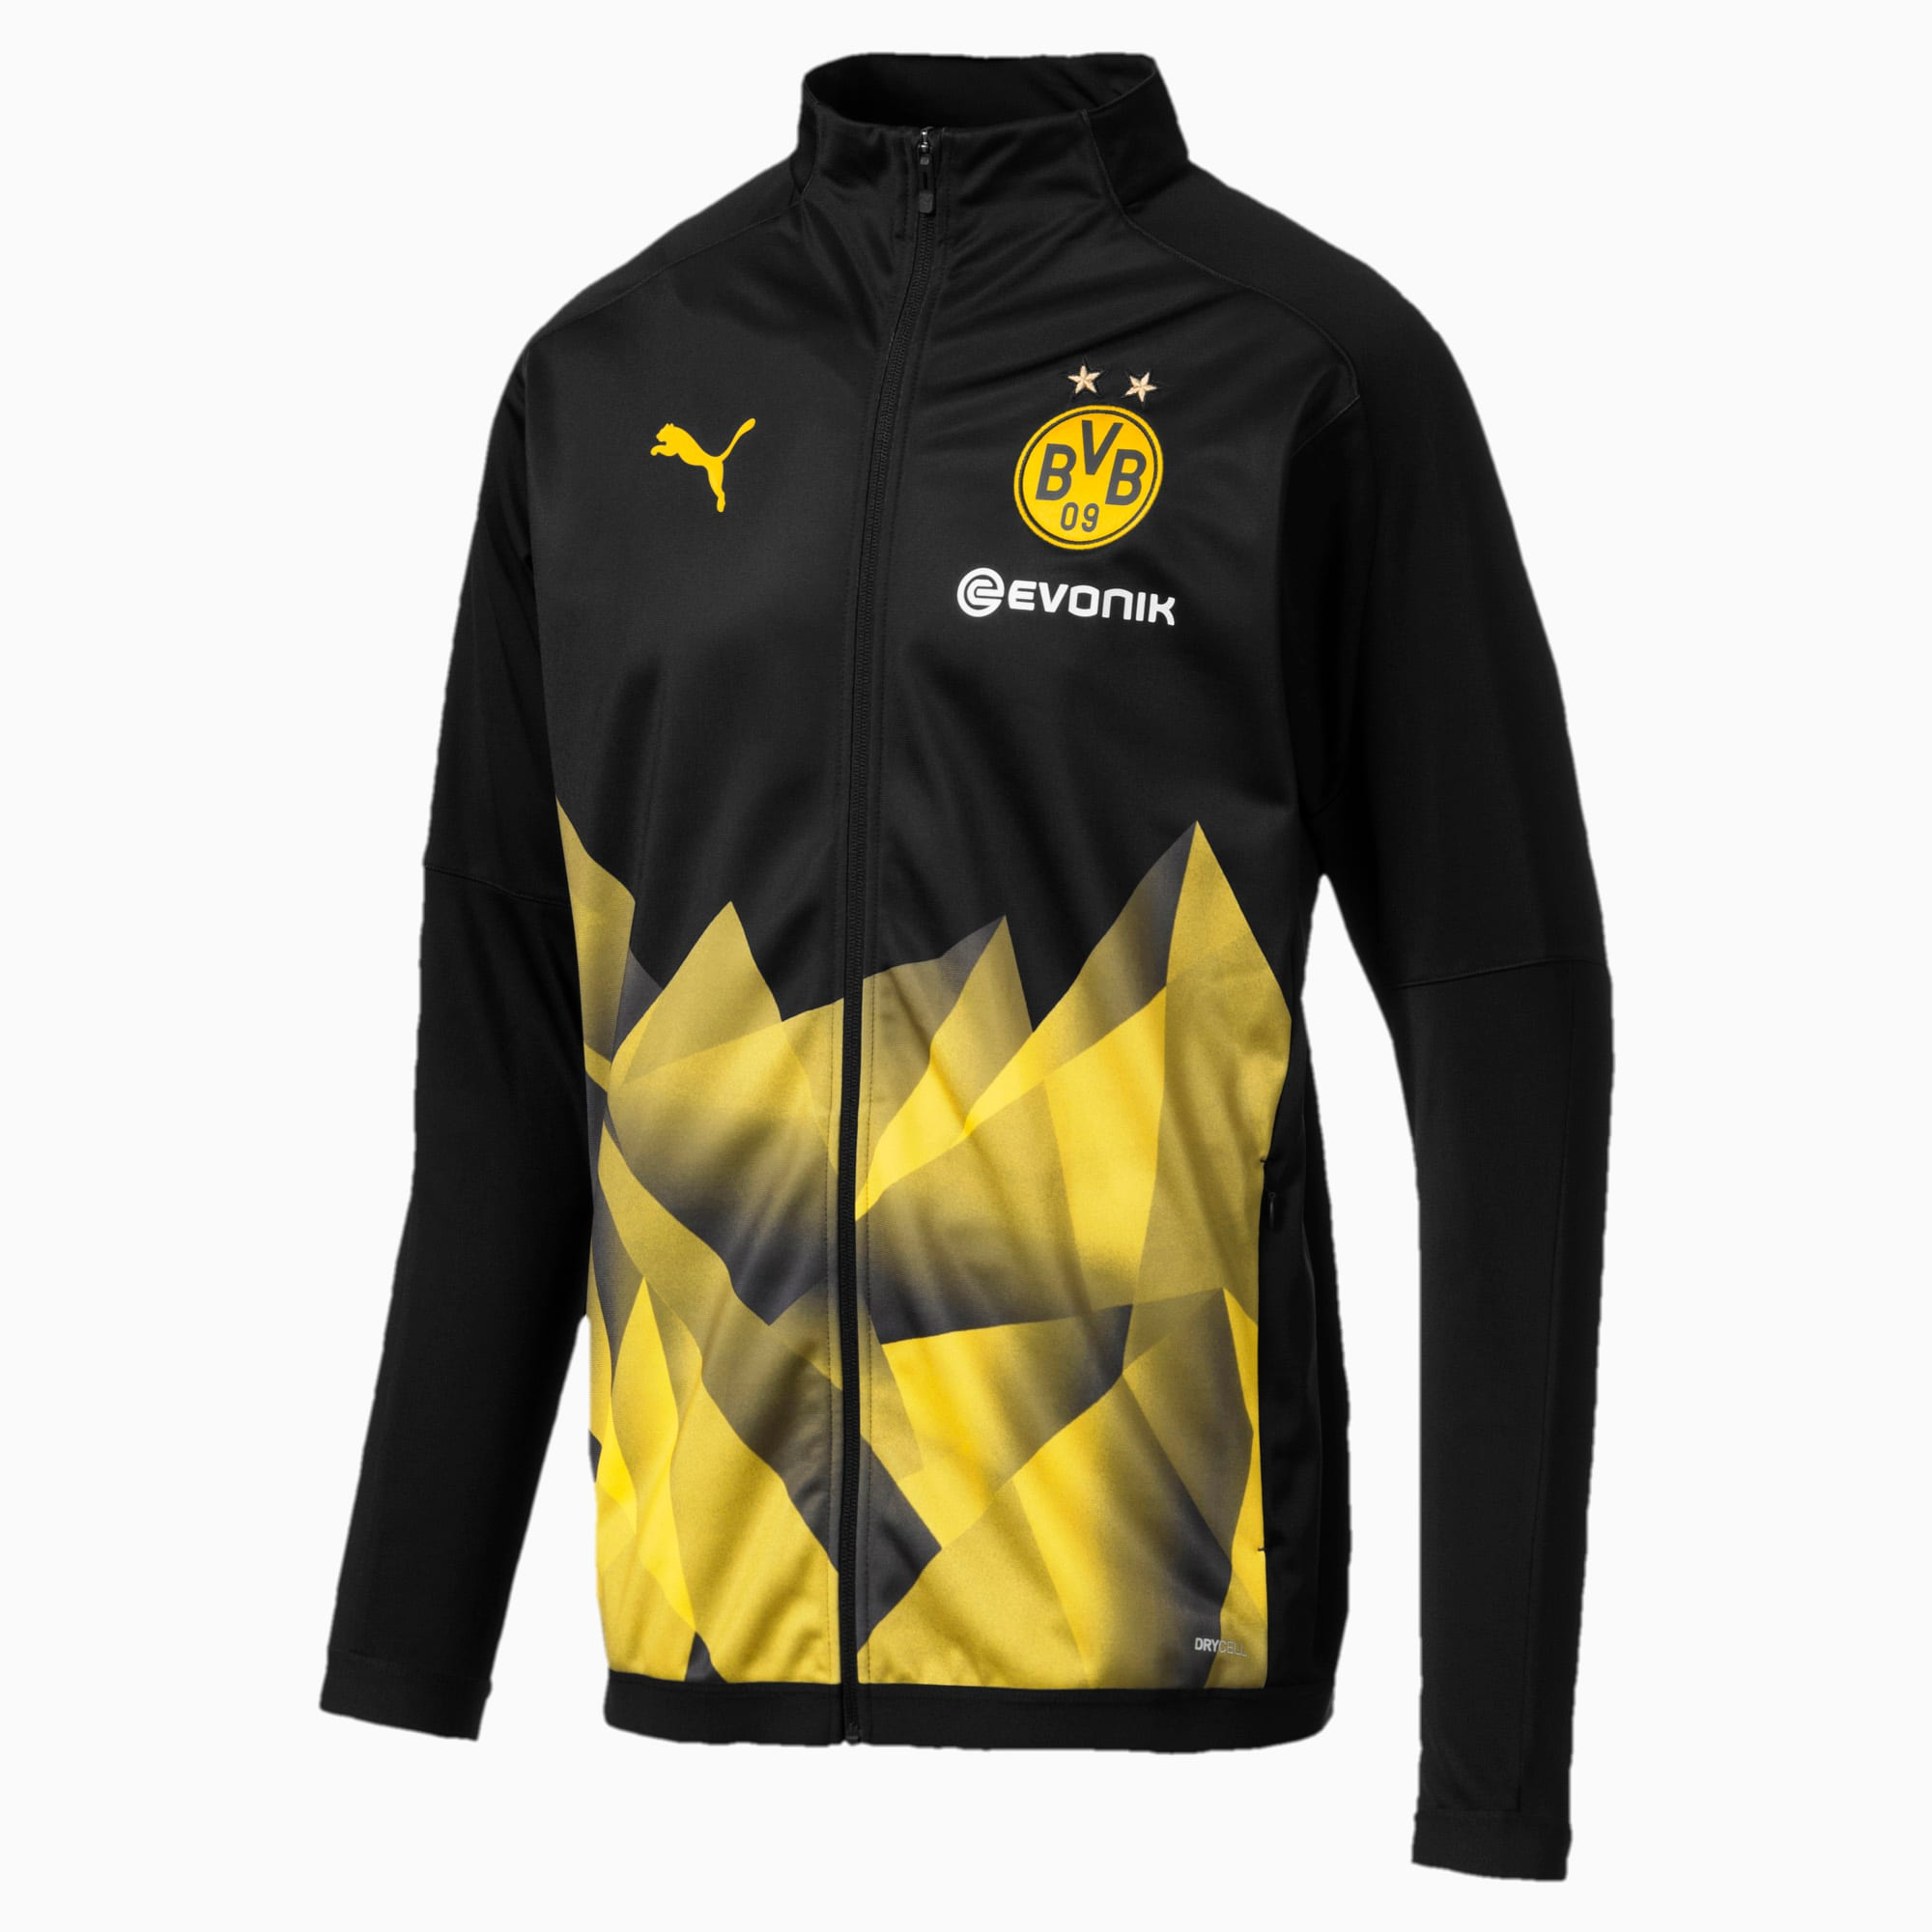 Stadium Yellow Jacket